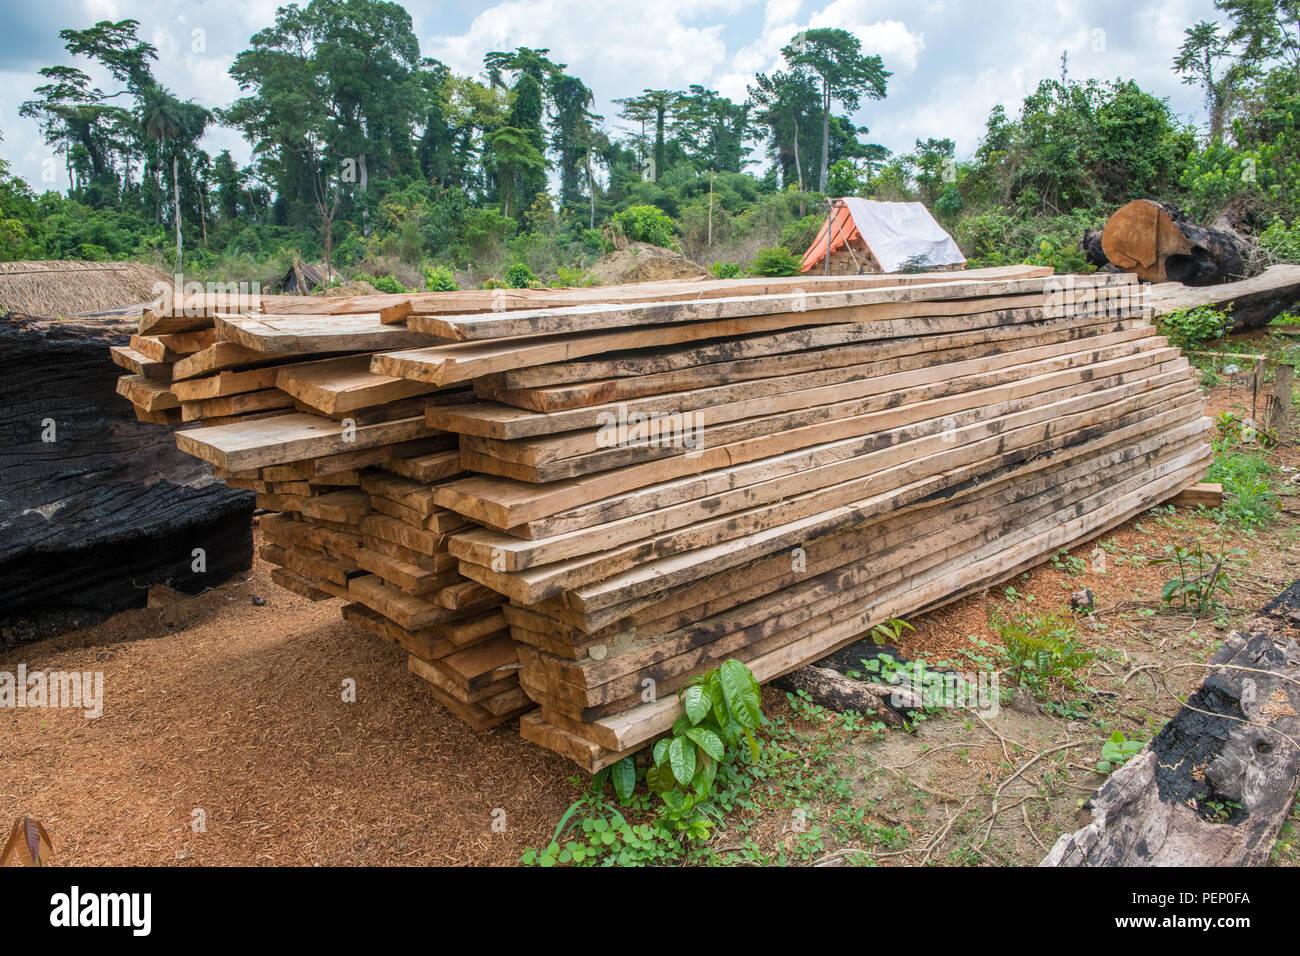 Stacked wood in Ganta, Liberia - Stock Image